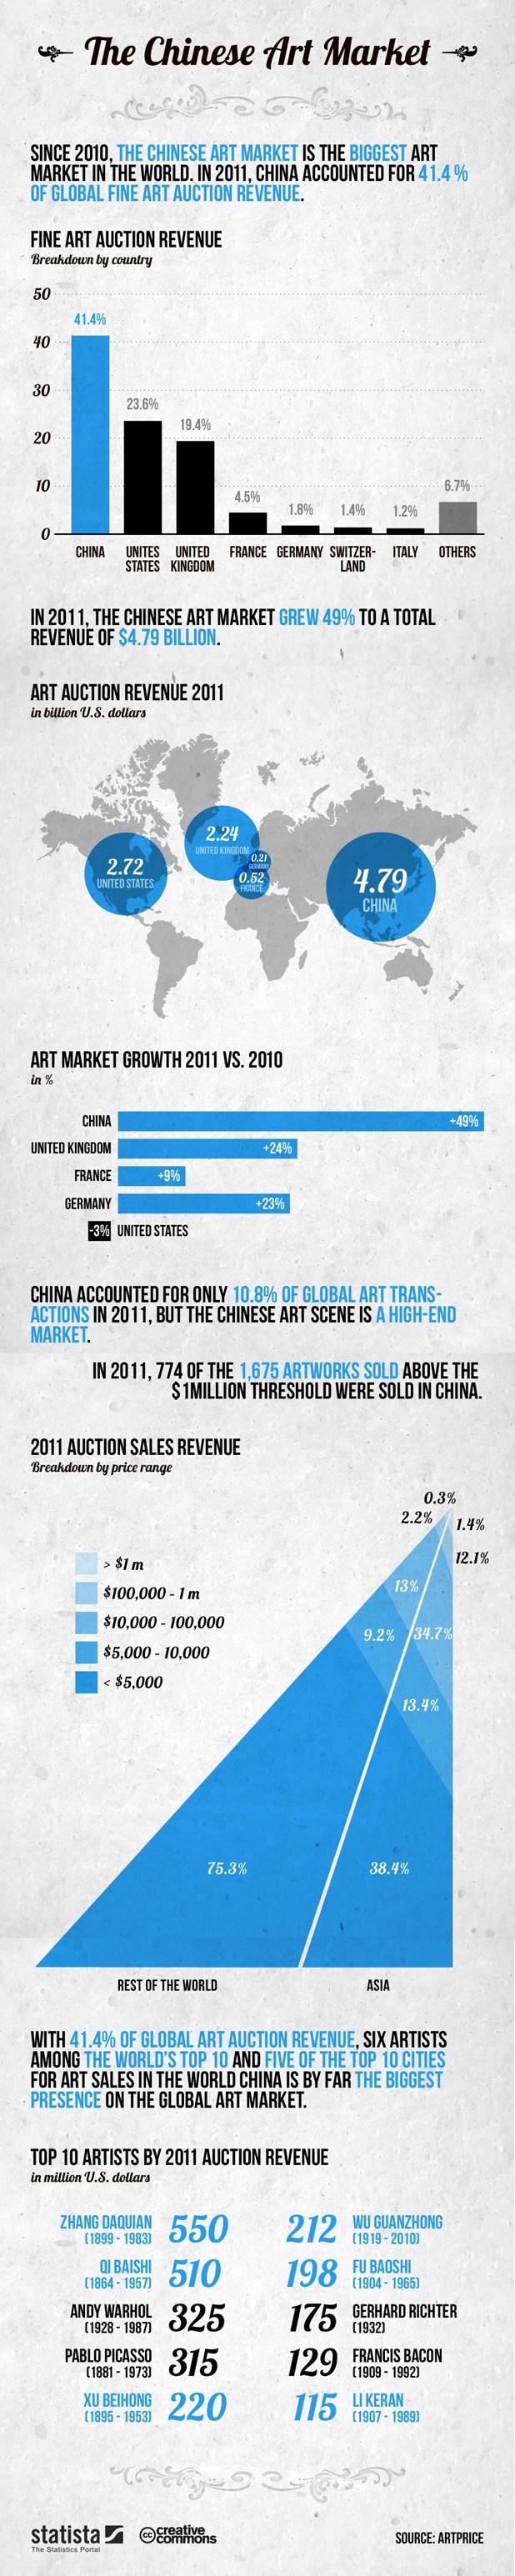 The Chinese Art Market: Biggest Art, Chine Art, Art Photography, Fashion Infographic, Global Art, Chinese Art, Digital Infographic, Canadian Art, Art Marketing